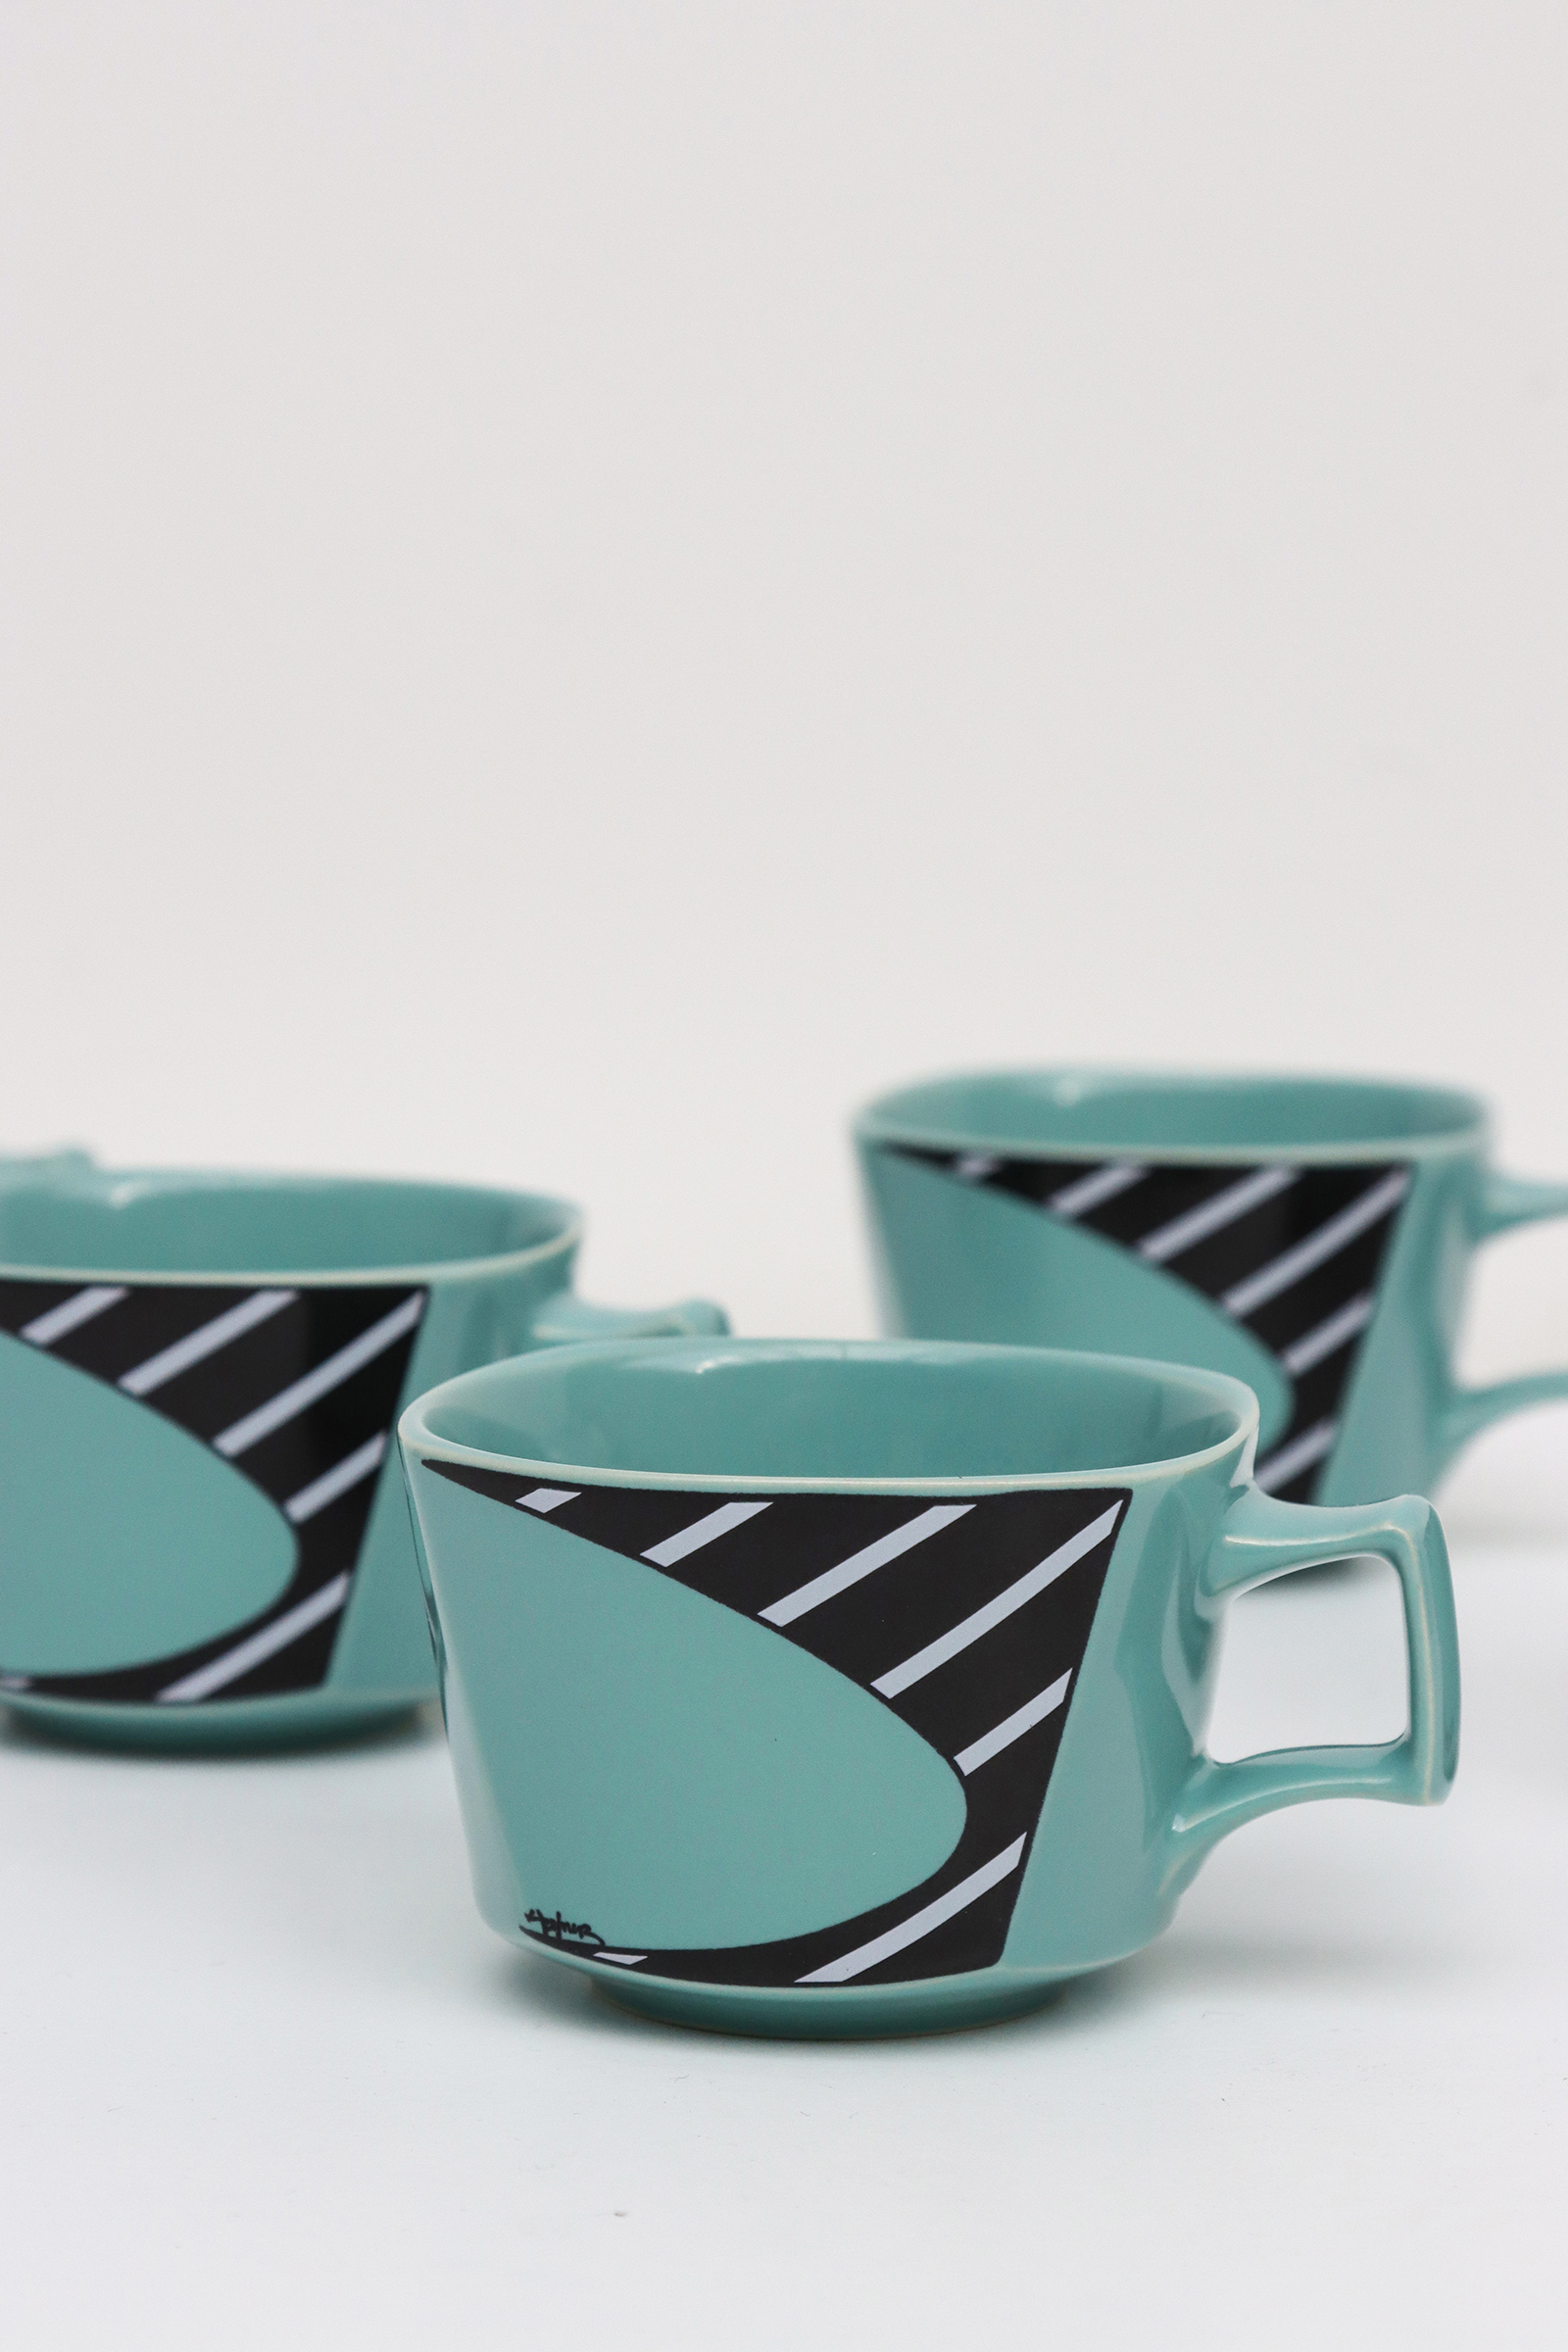 Flash Coffee and tea set by Dorothy Hafner for Rosenthalimage 7